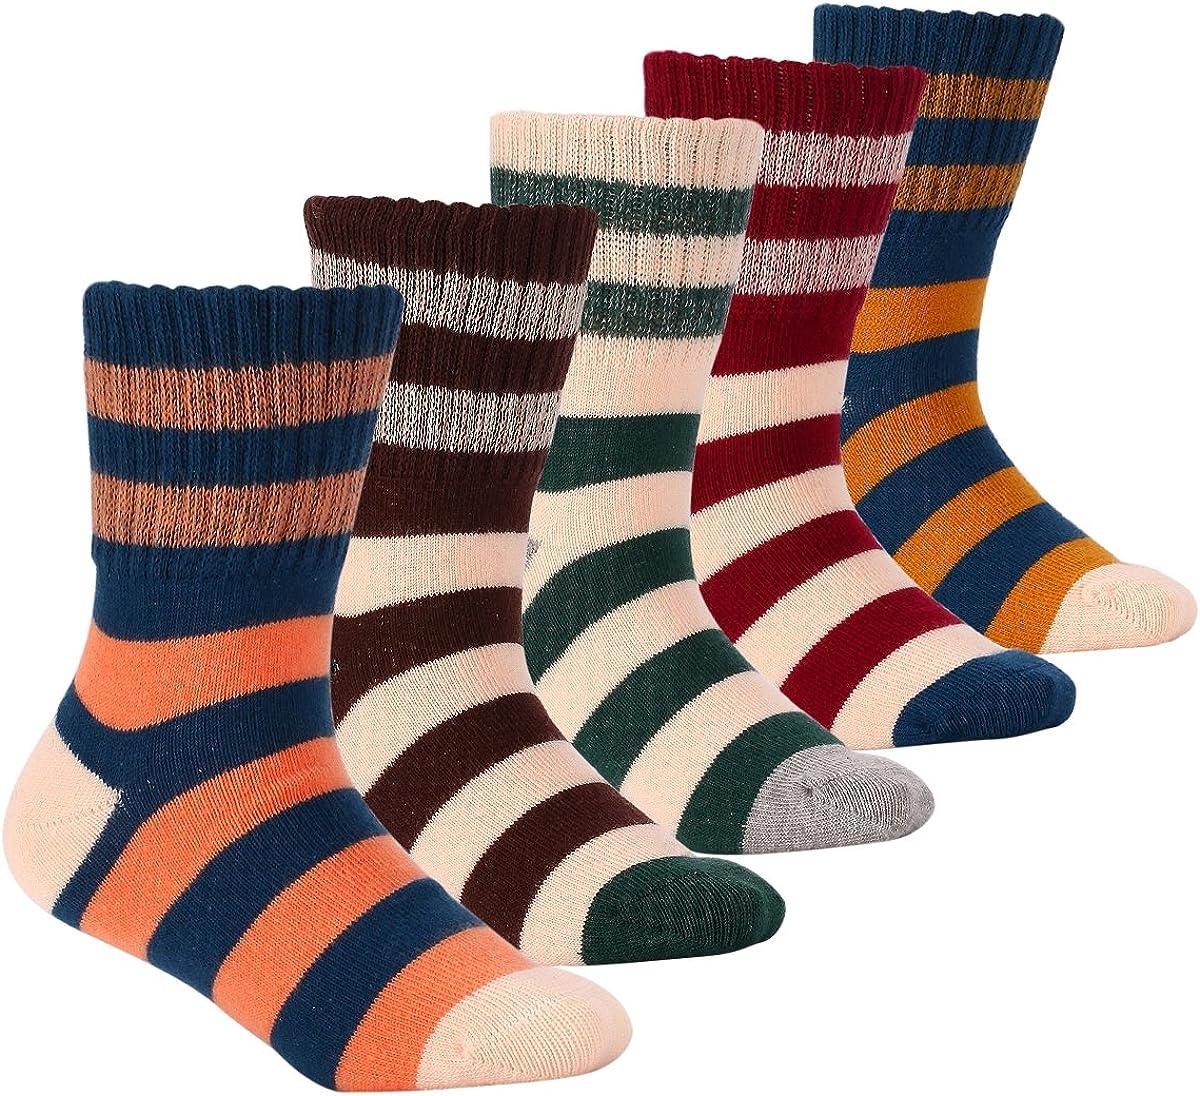 Boys Cotton Socks Kids Winter Seamless Warm Socks 5 Pack